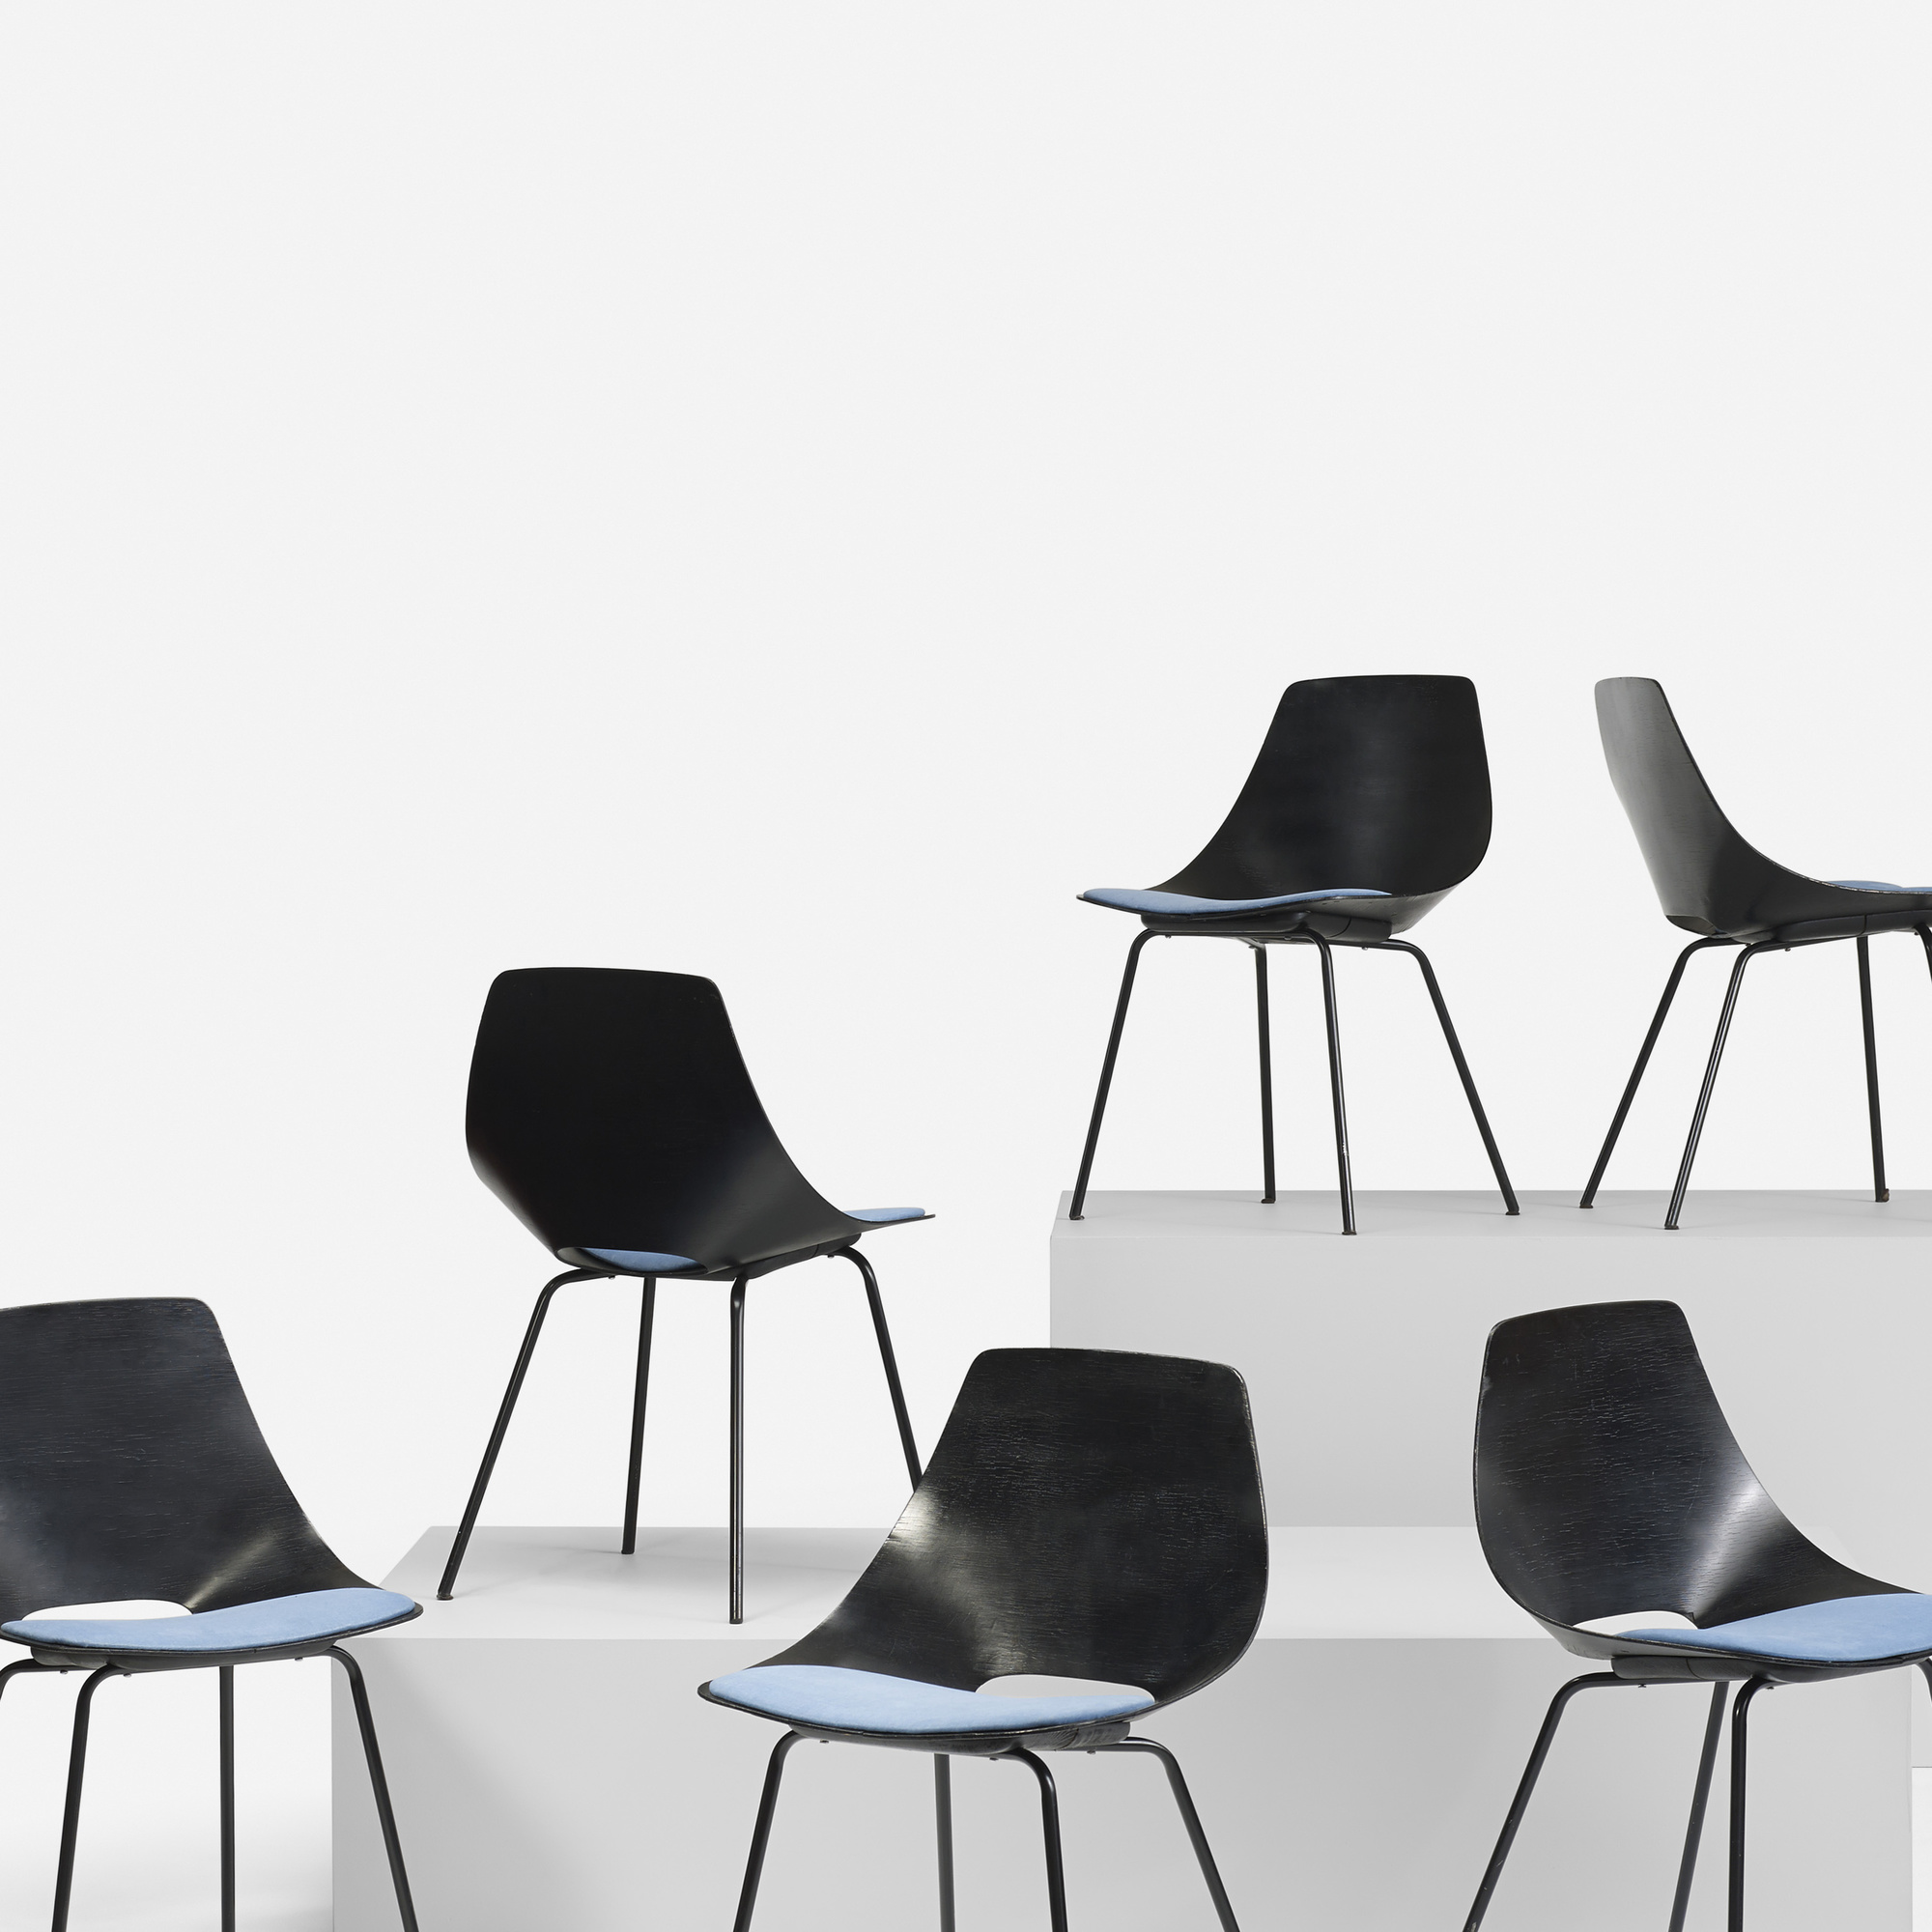 314: Pierre Guariche / Tonneau chairs, set of six (3 of 4)